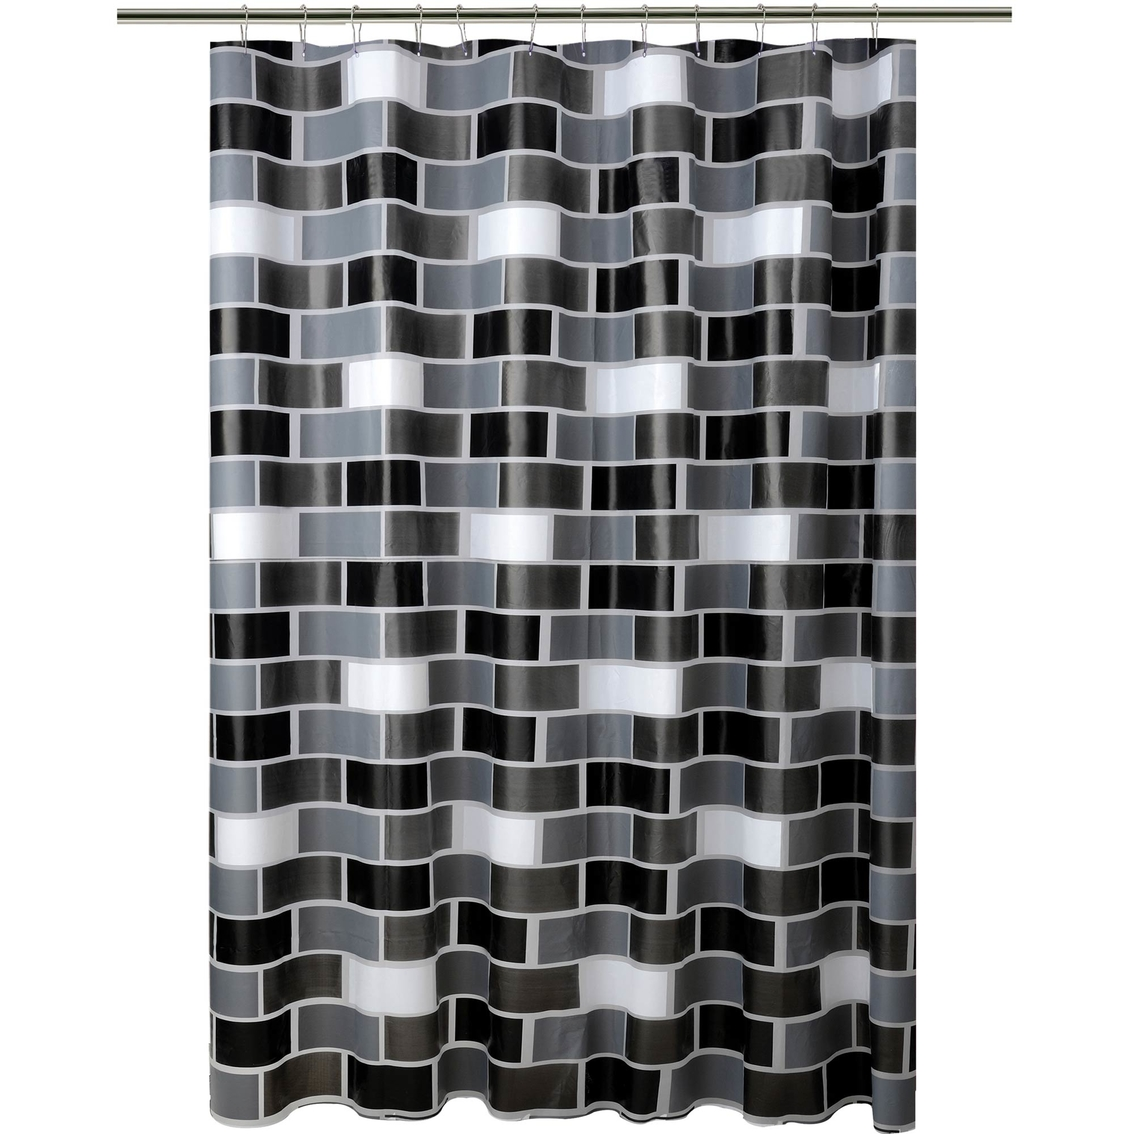 Bath Bliss Brick Design Shower Curtain Shower Curtains Hooks